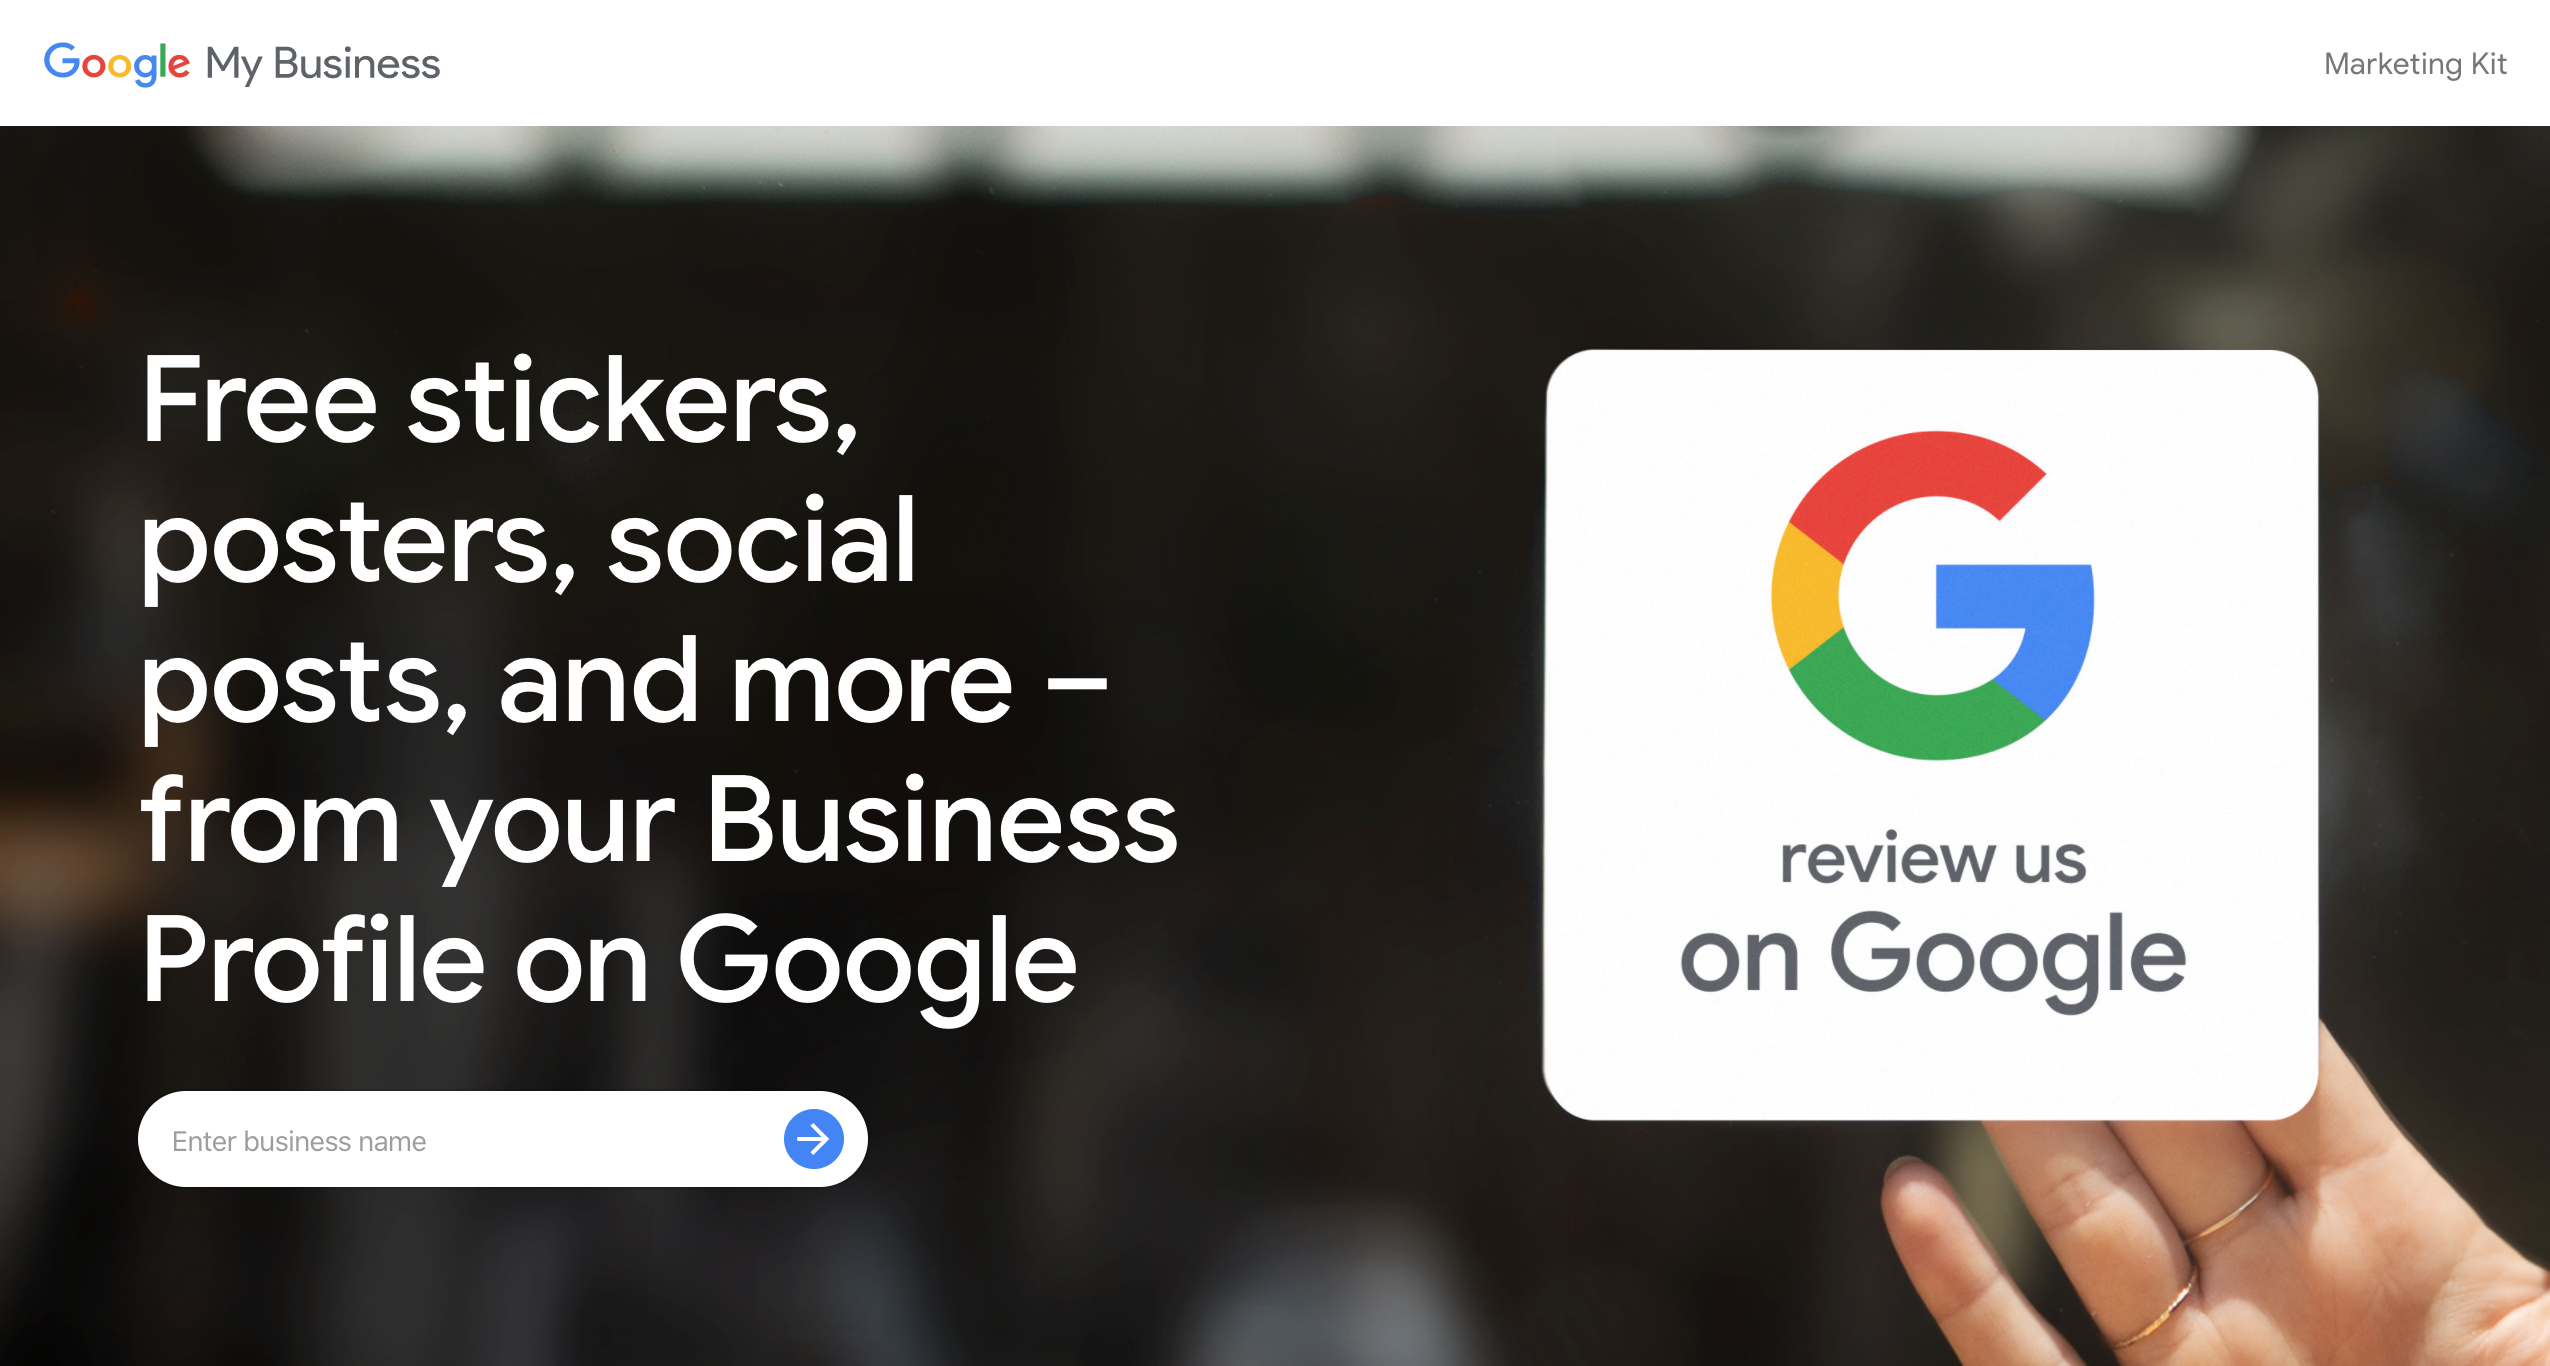 Google My Business Marketing Kit